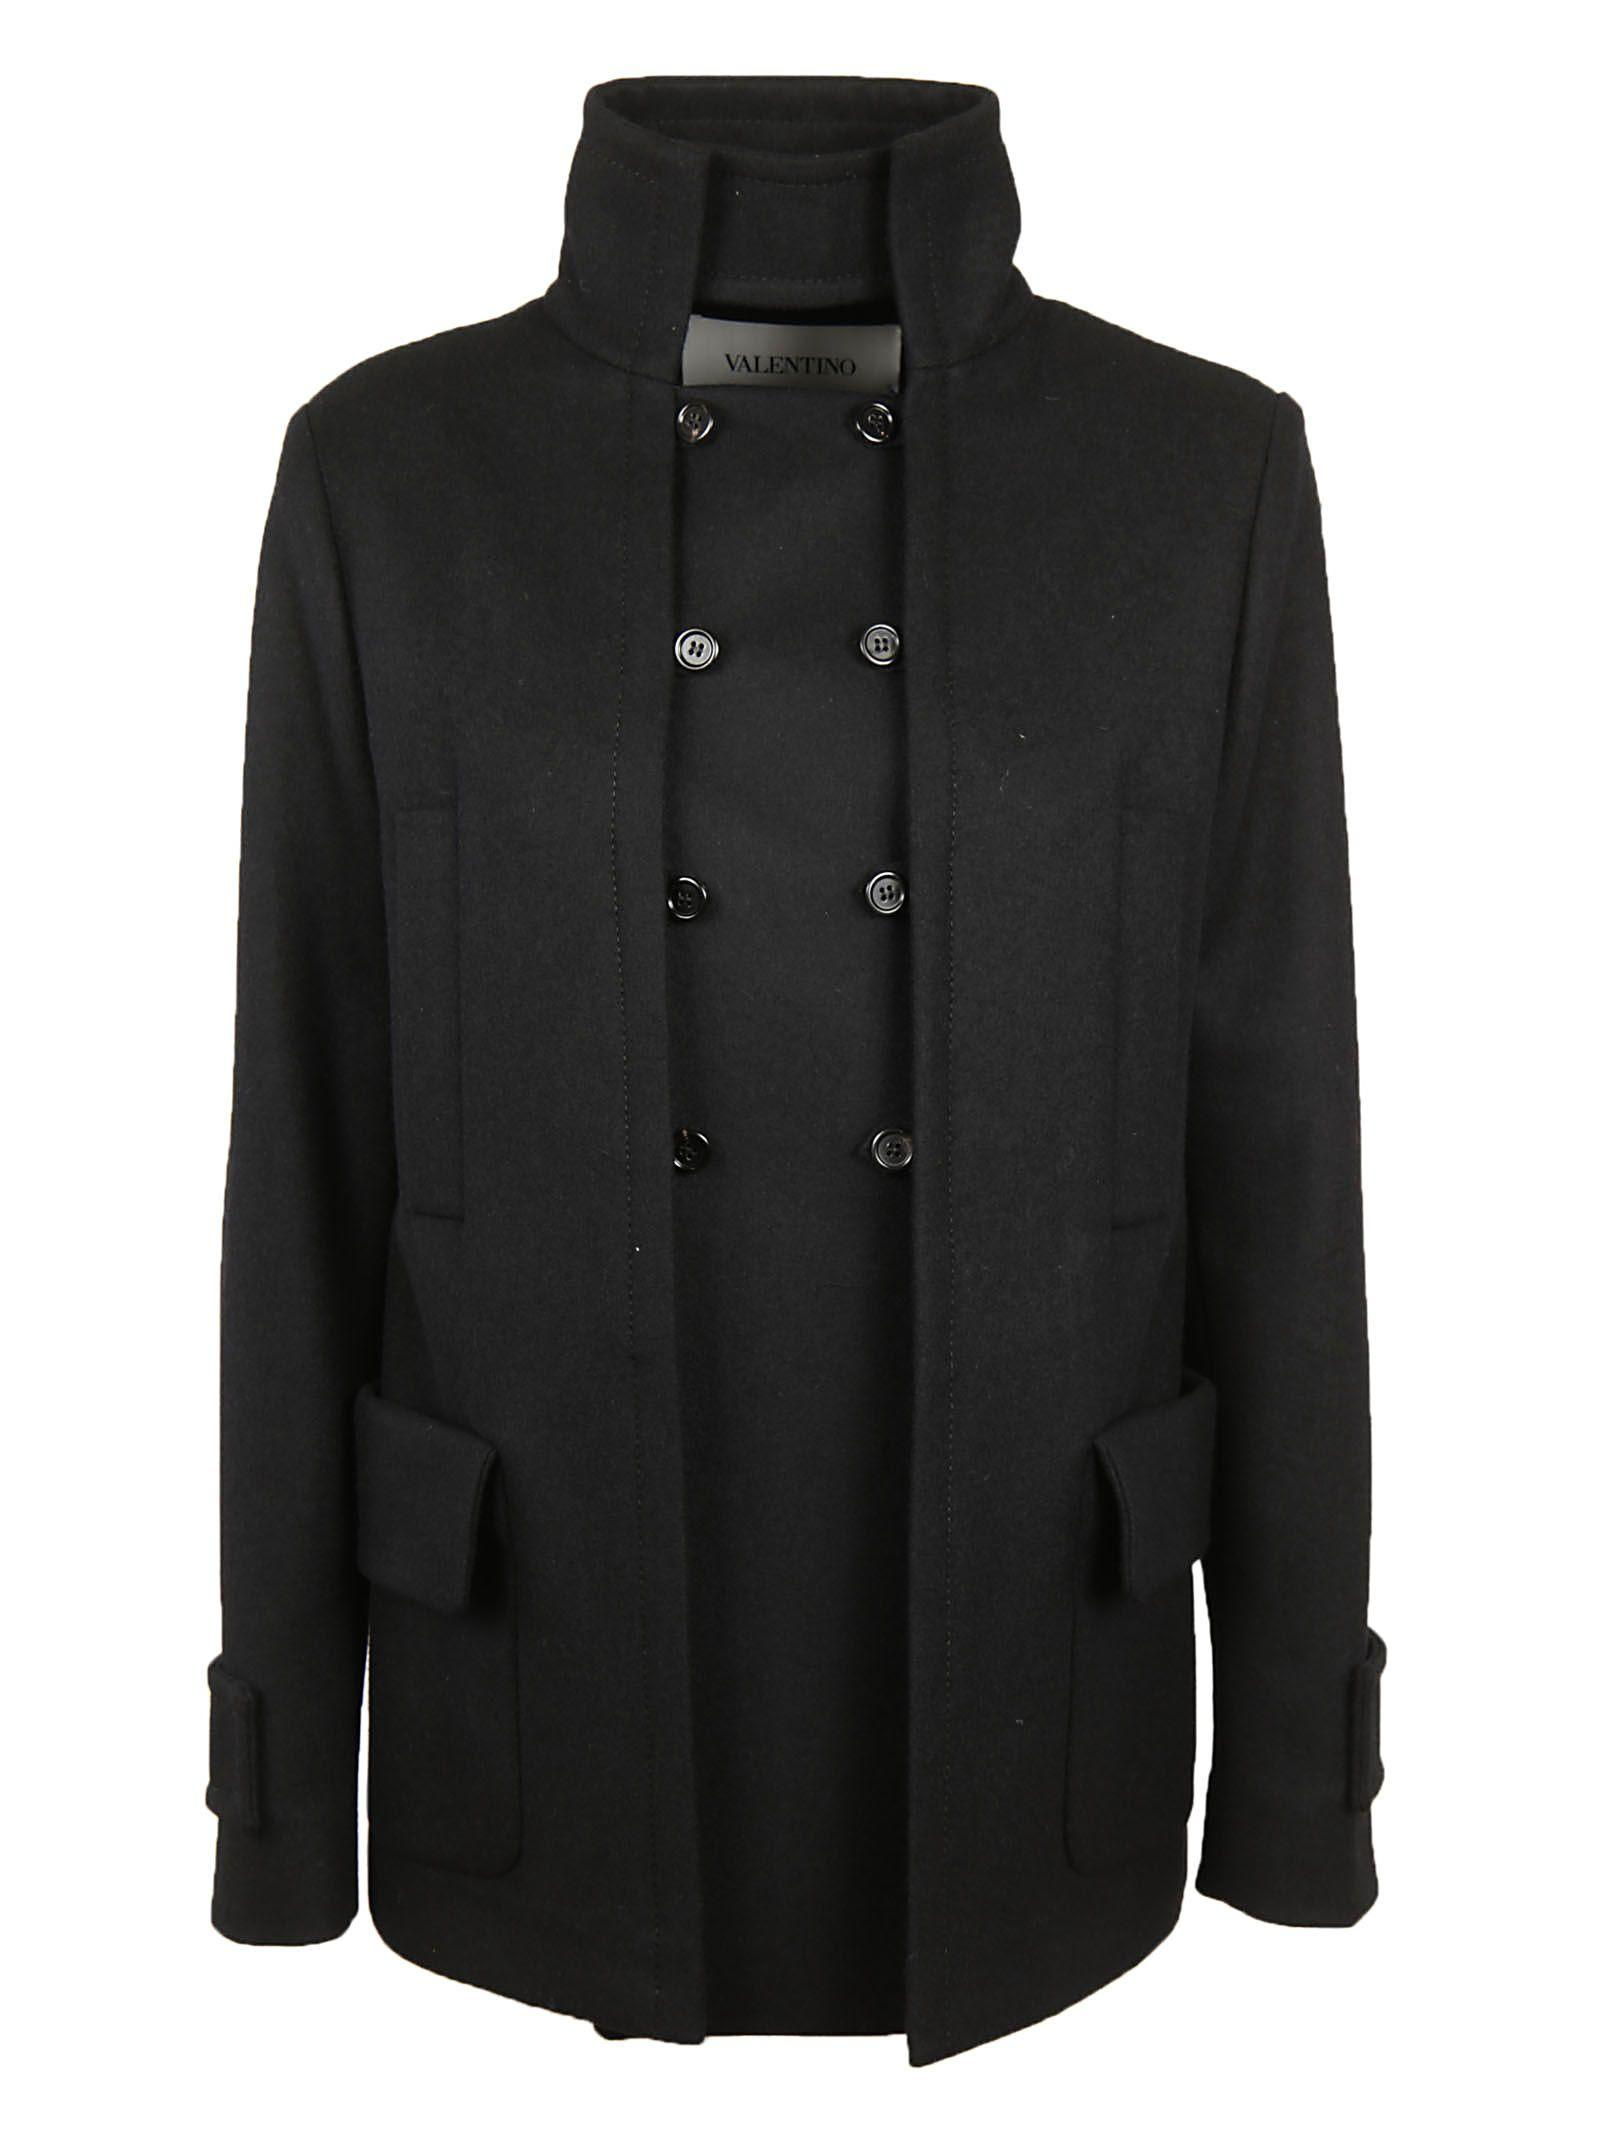 Valentino Button-up Jacket In Black